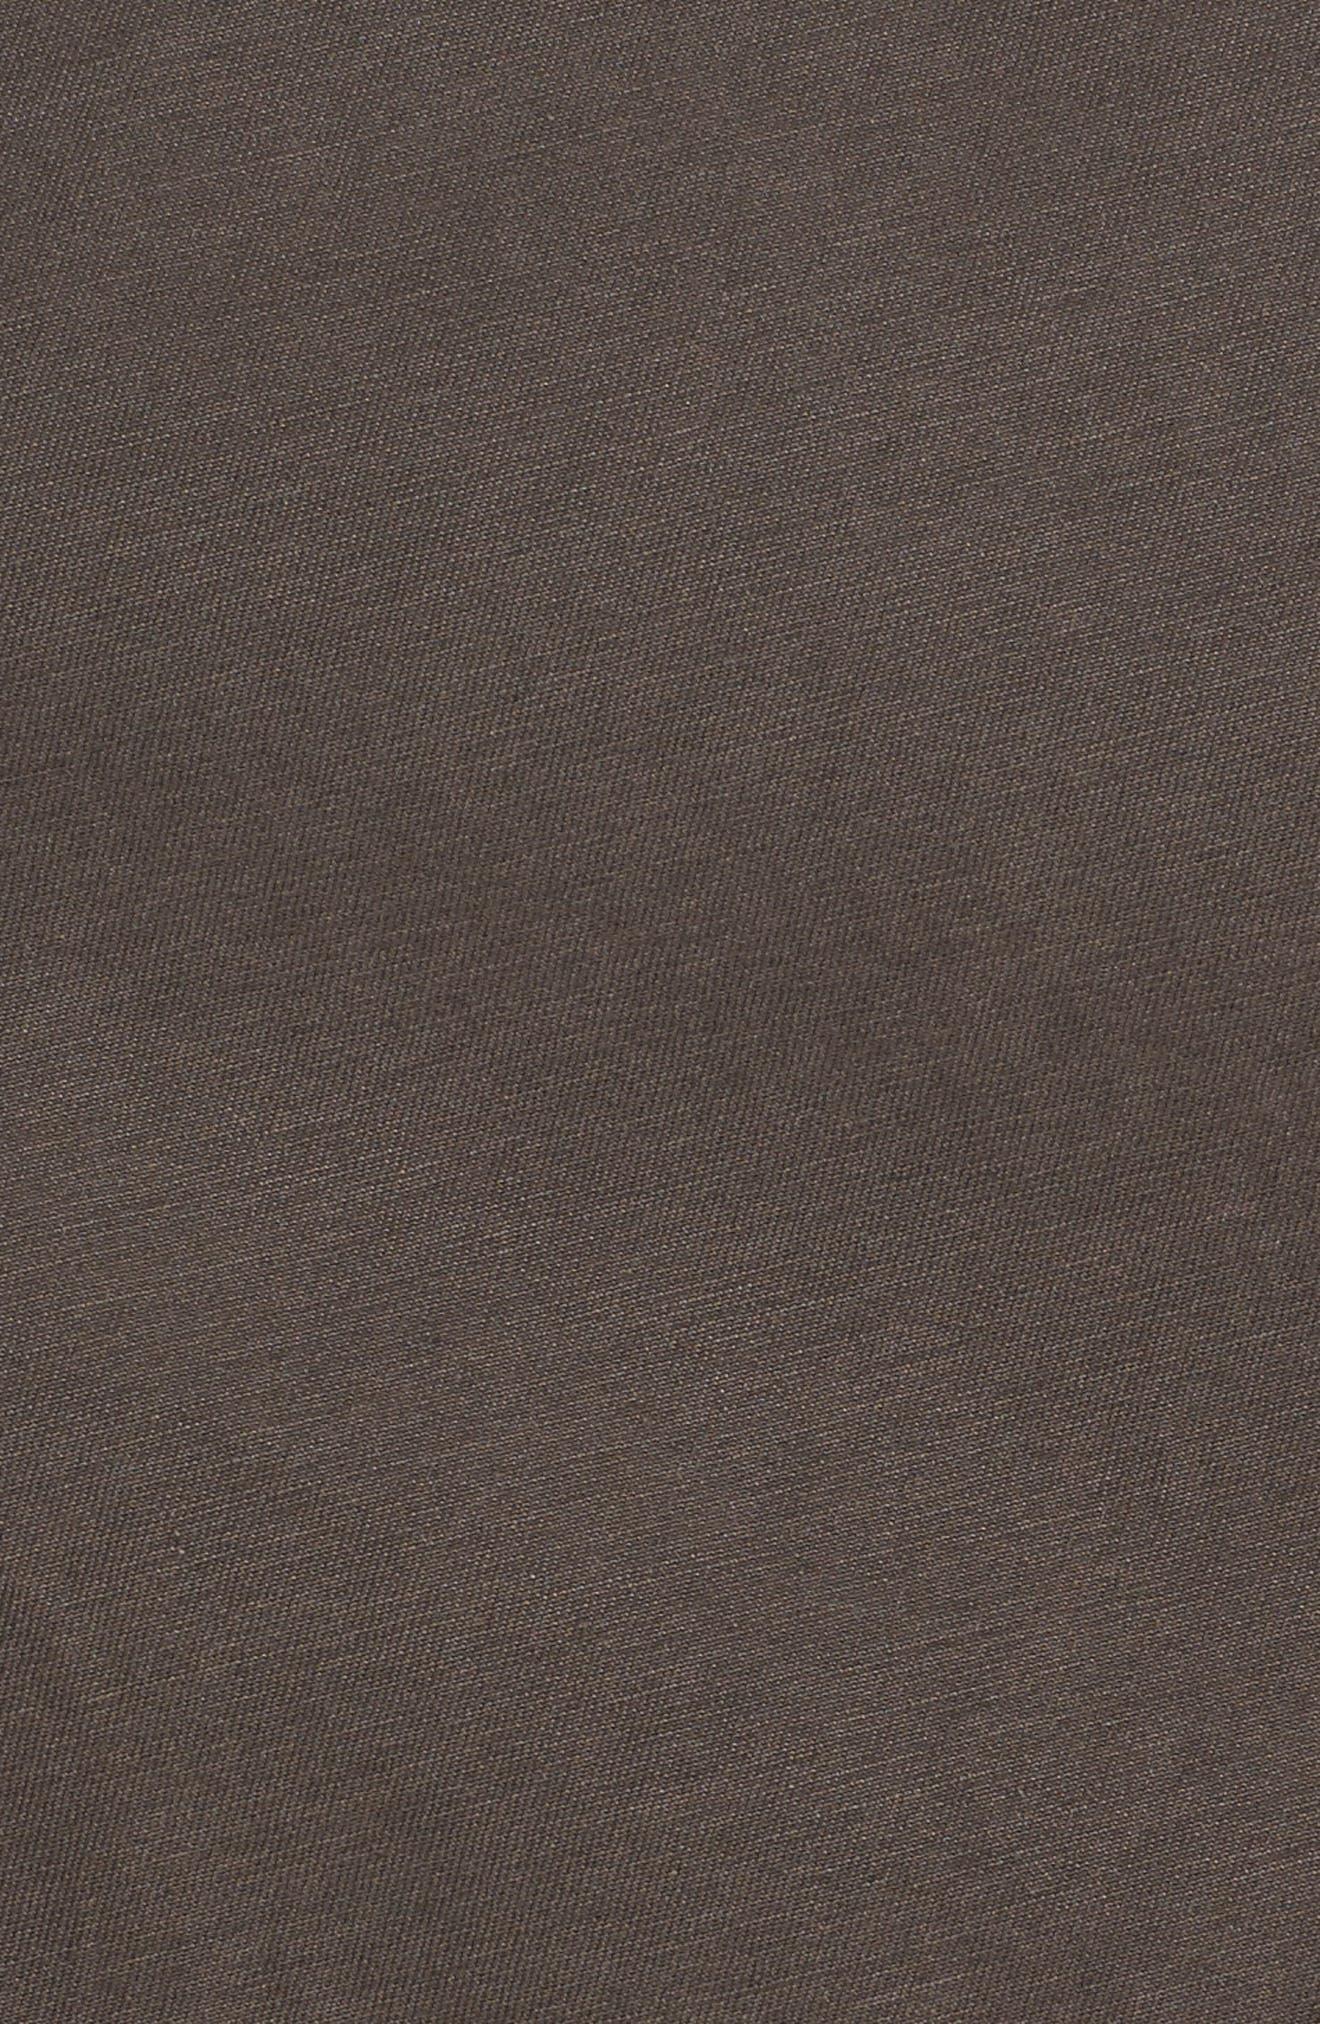 Hooded Cotton Utility Jacket,                             Alternate thumbnail 17, color,